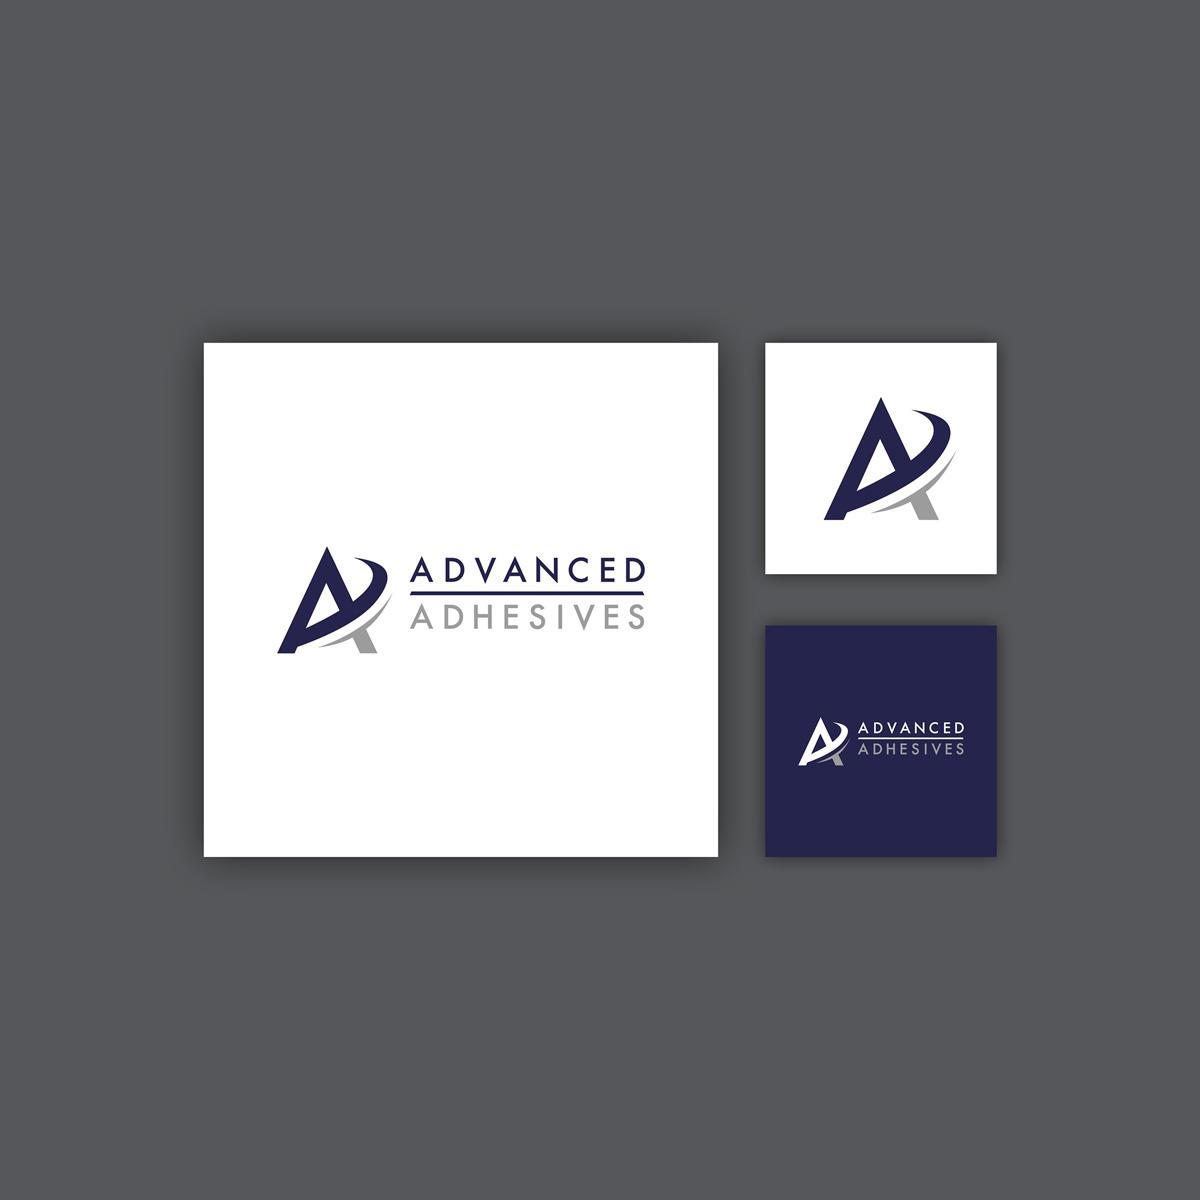 NEW BRAND (Advanced Adhesives)